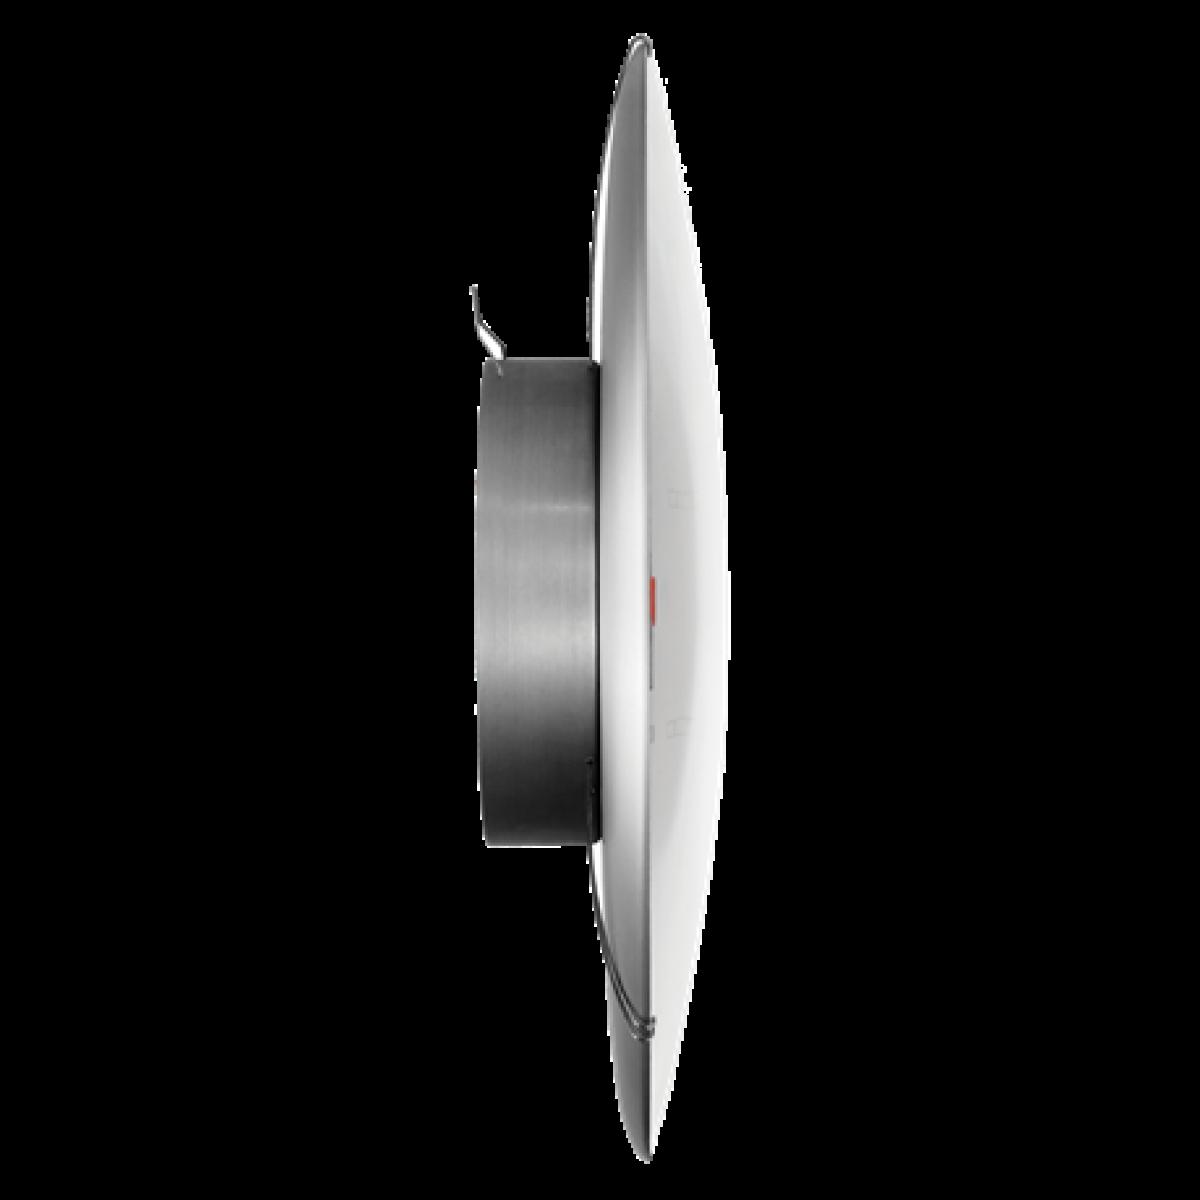 ARNEJACOBSENRomanvgur48cm-07